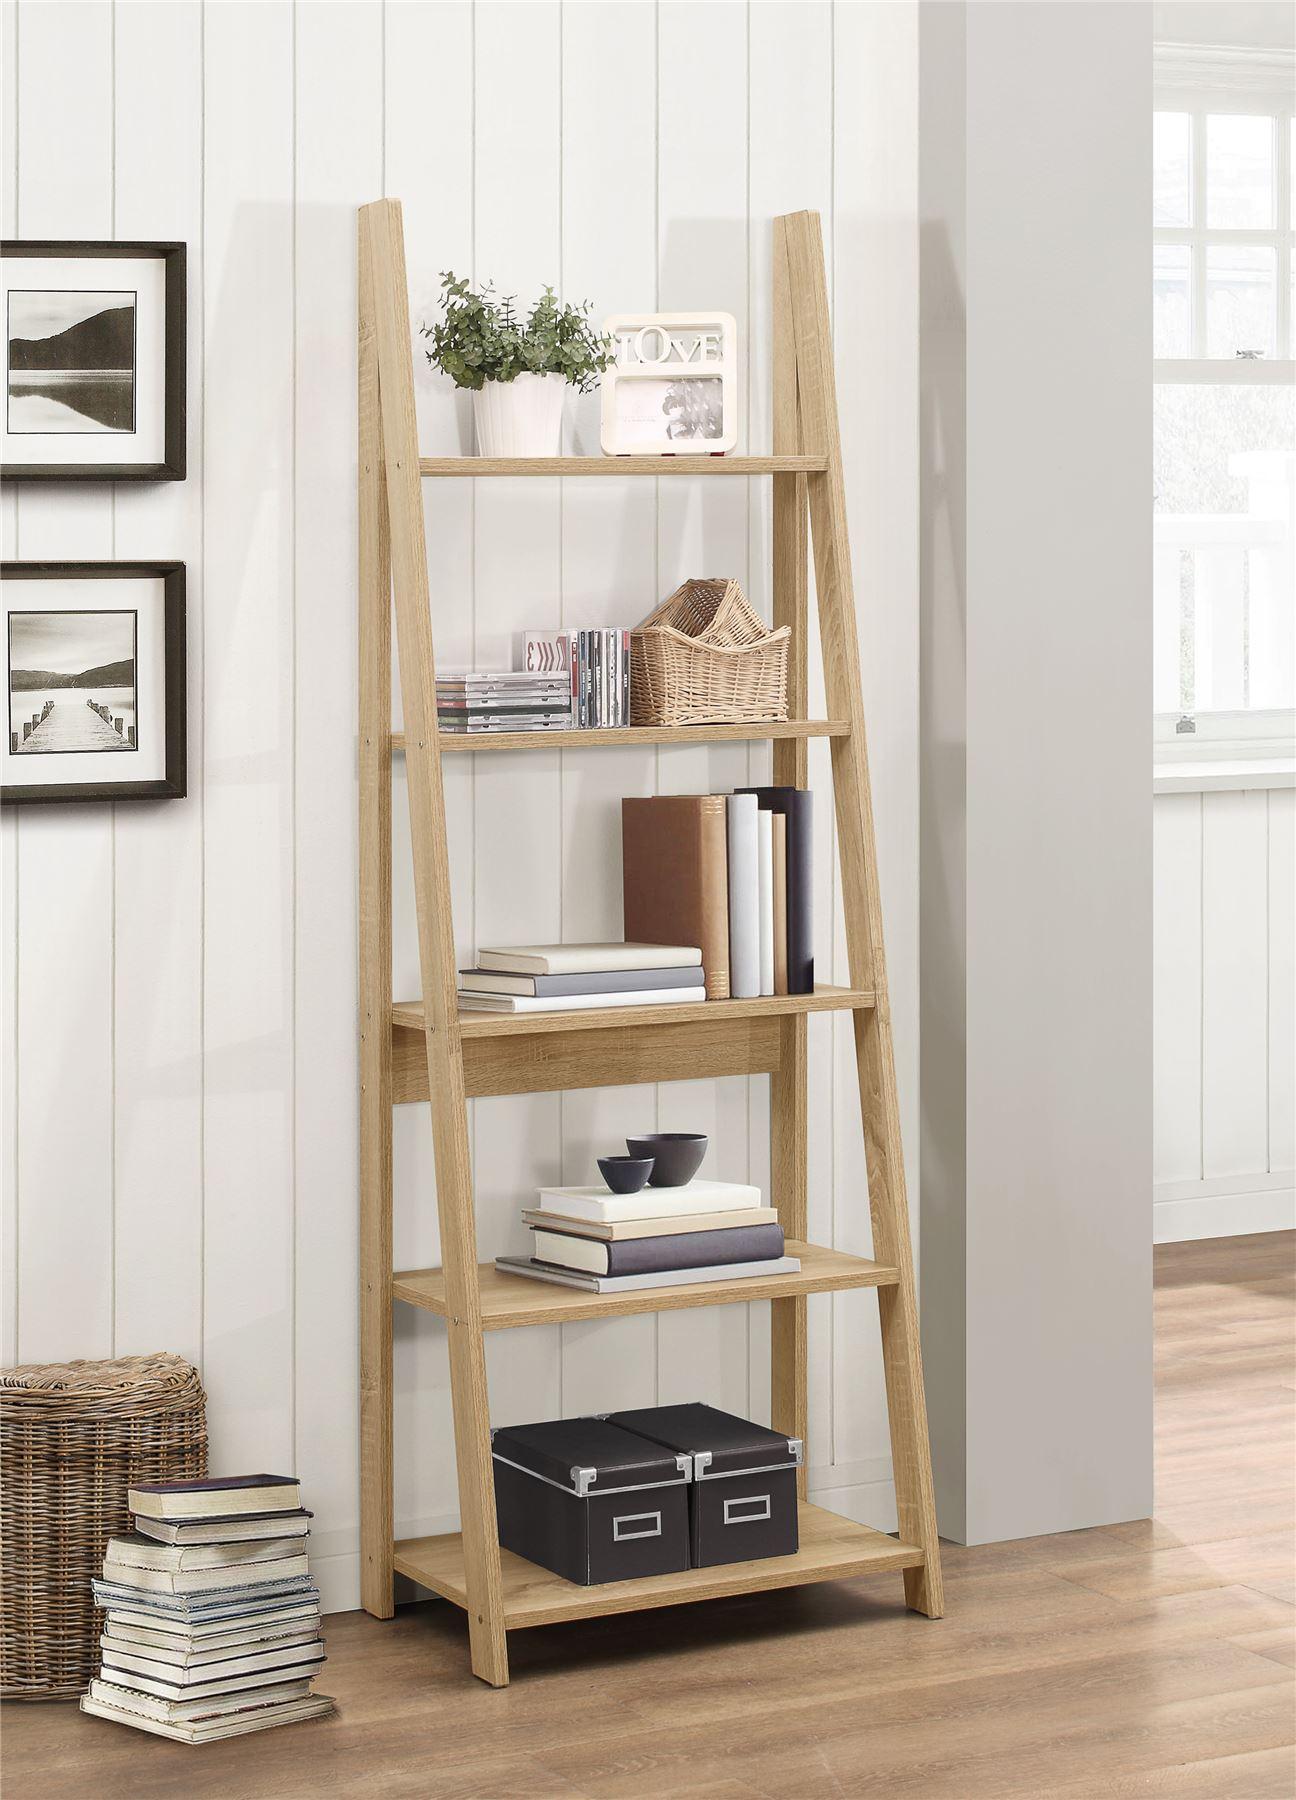 Birlea Nordic Scandinavian Retro Ladder Bookcase Shelving